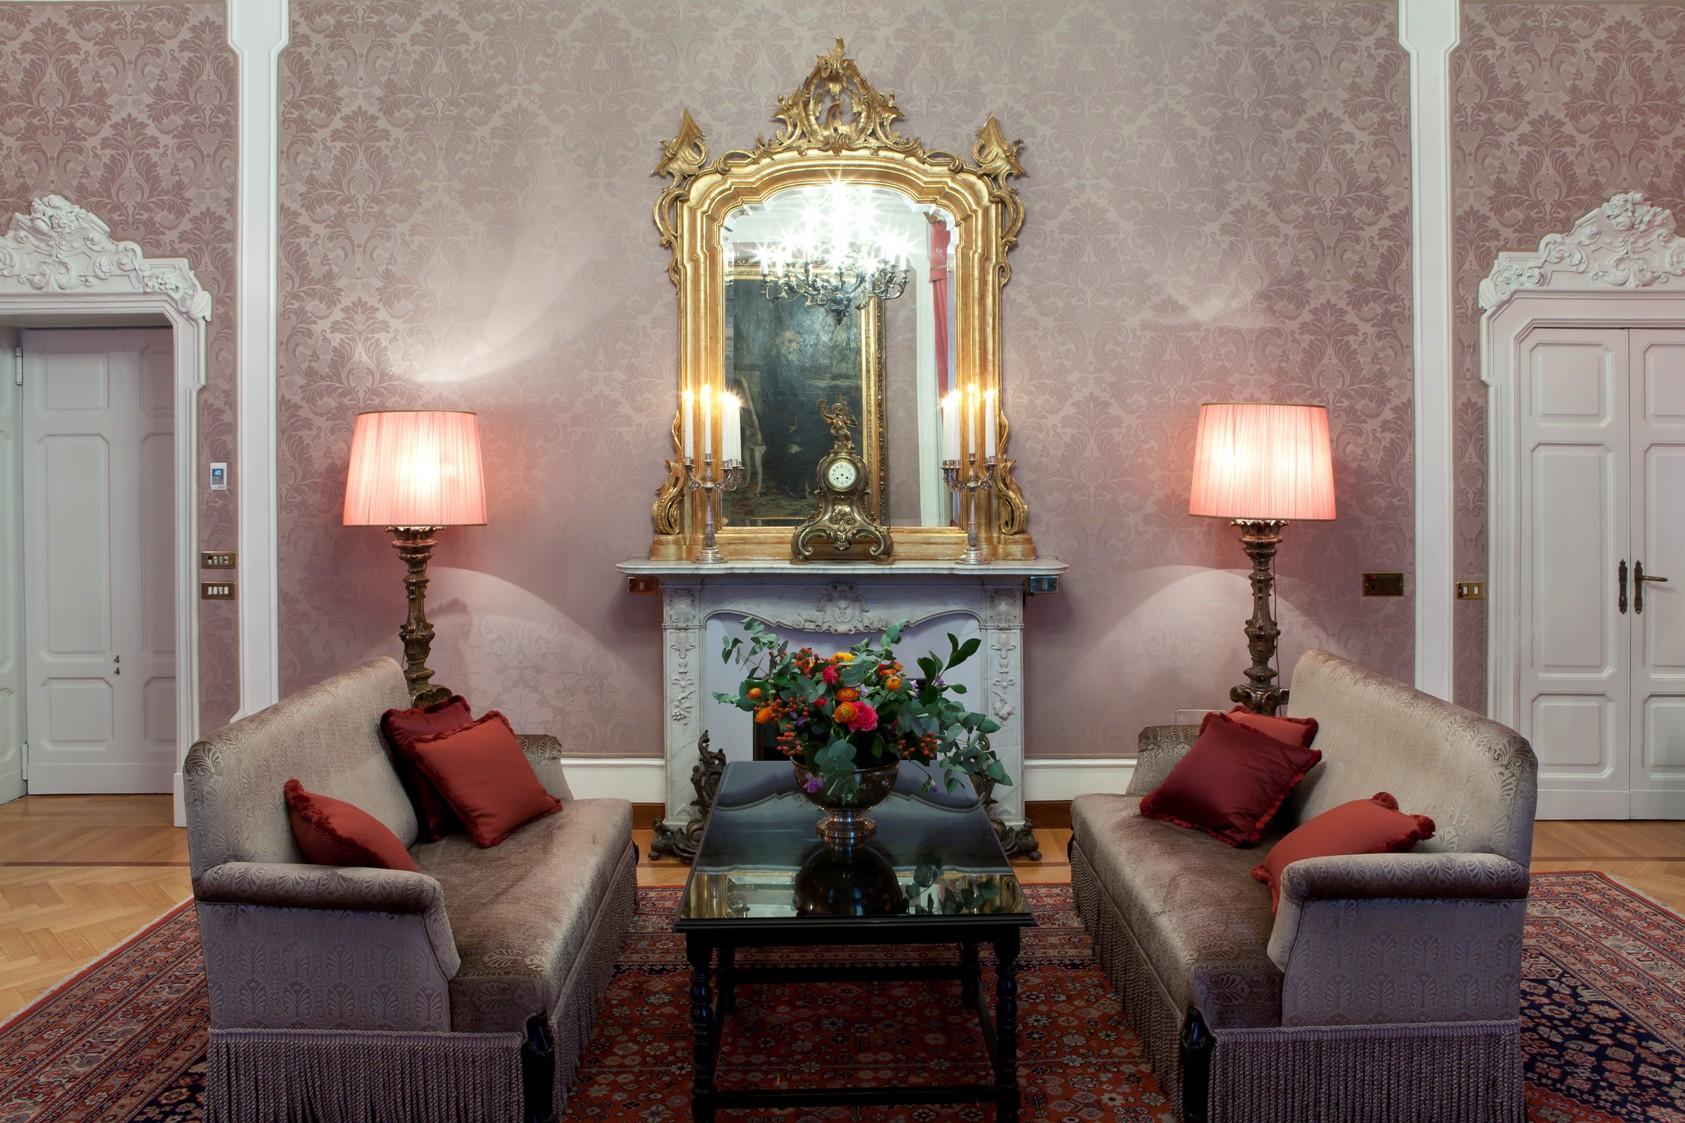 Courtesy Grand Hotel et de Milan